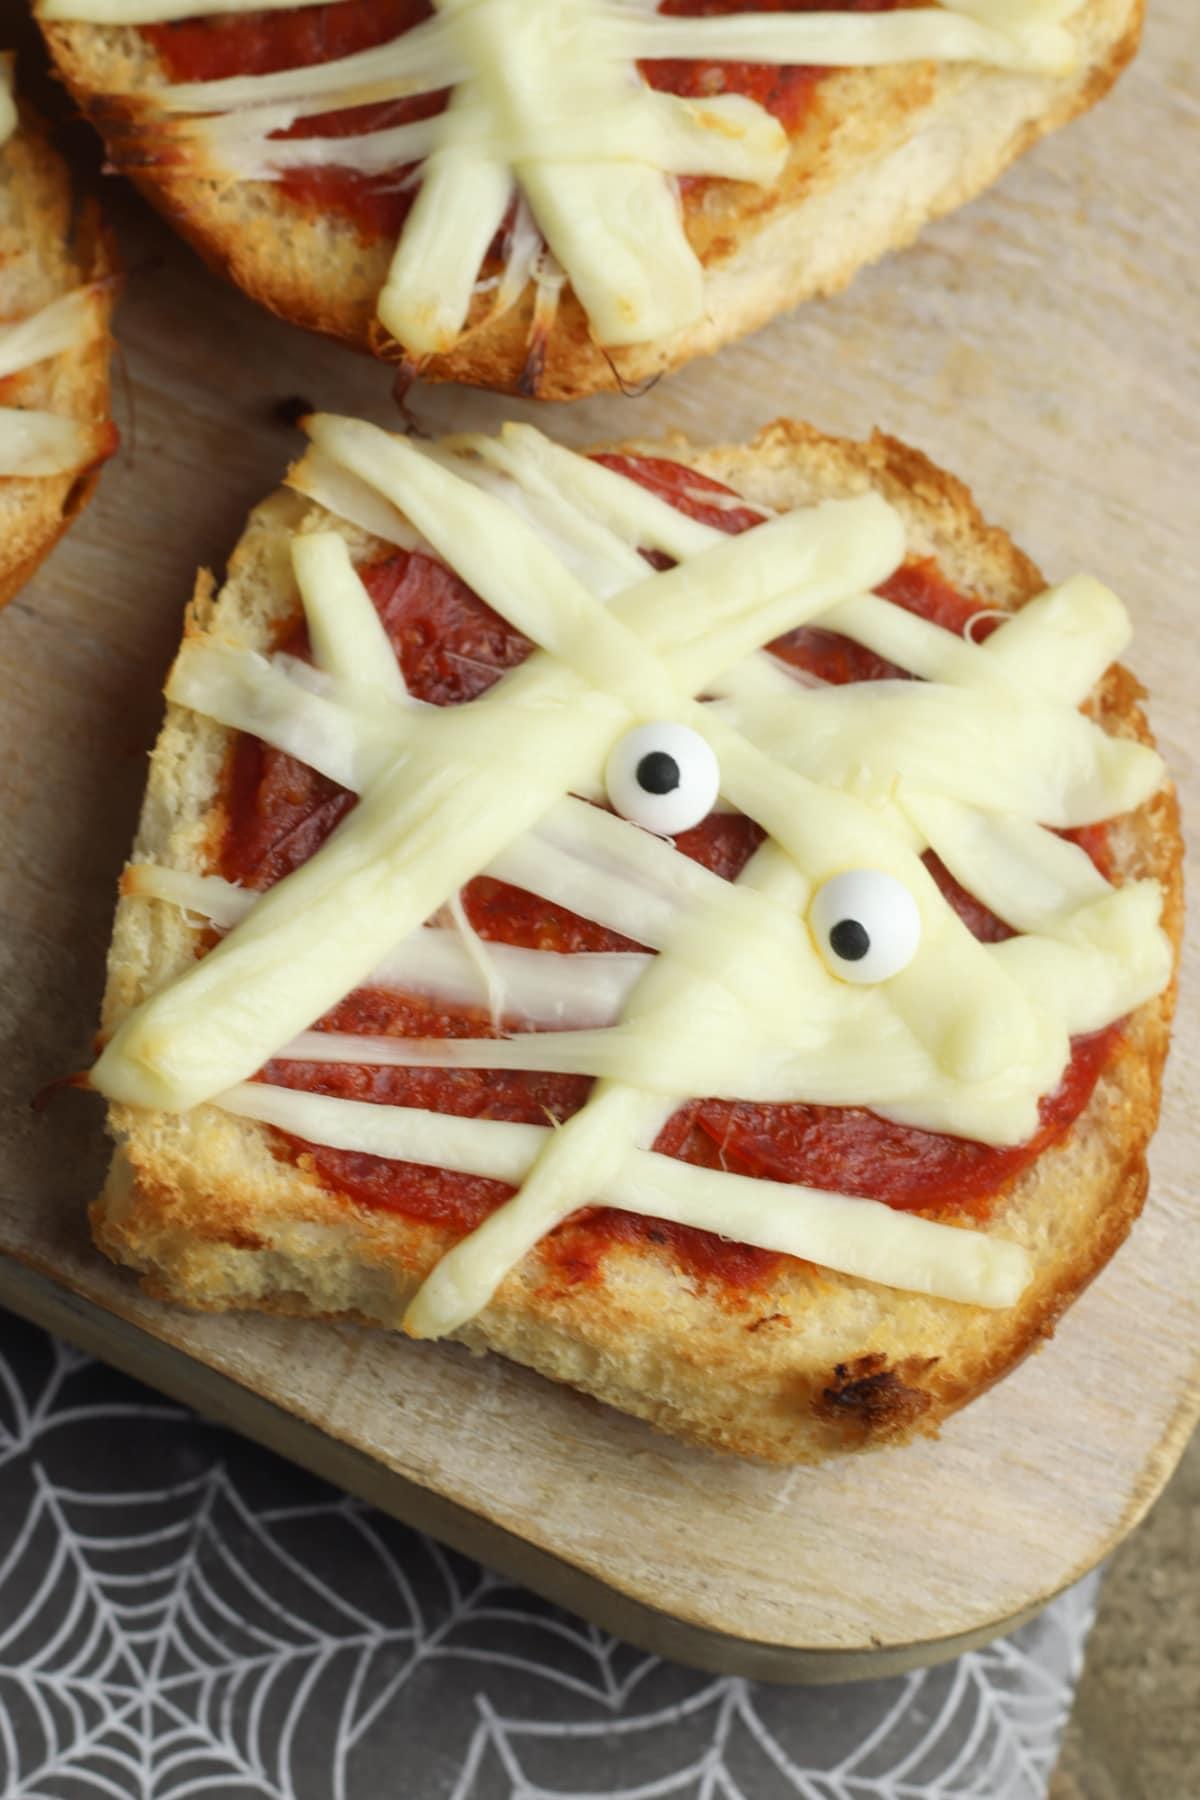 Mummy Pizza on cutting board